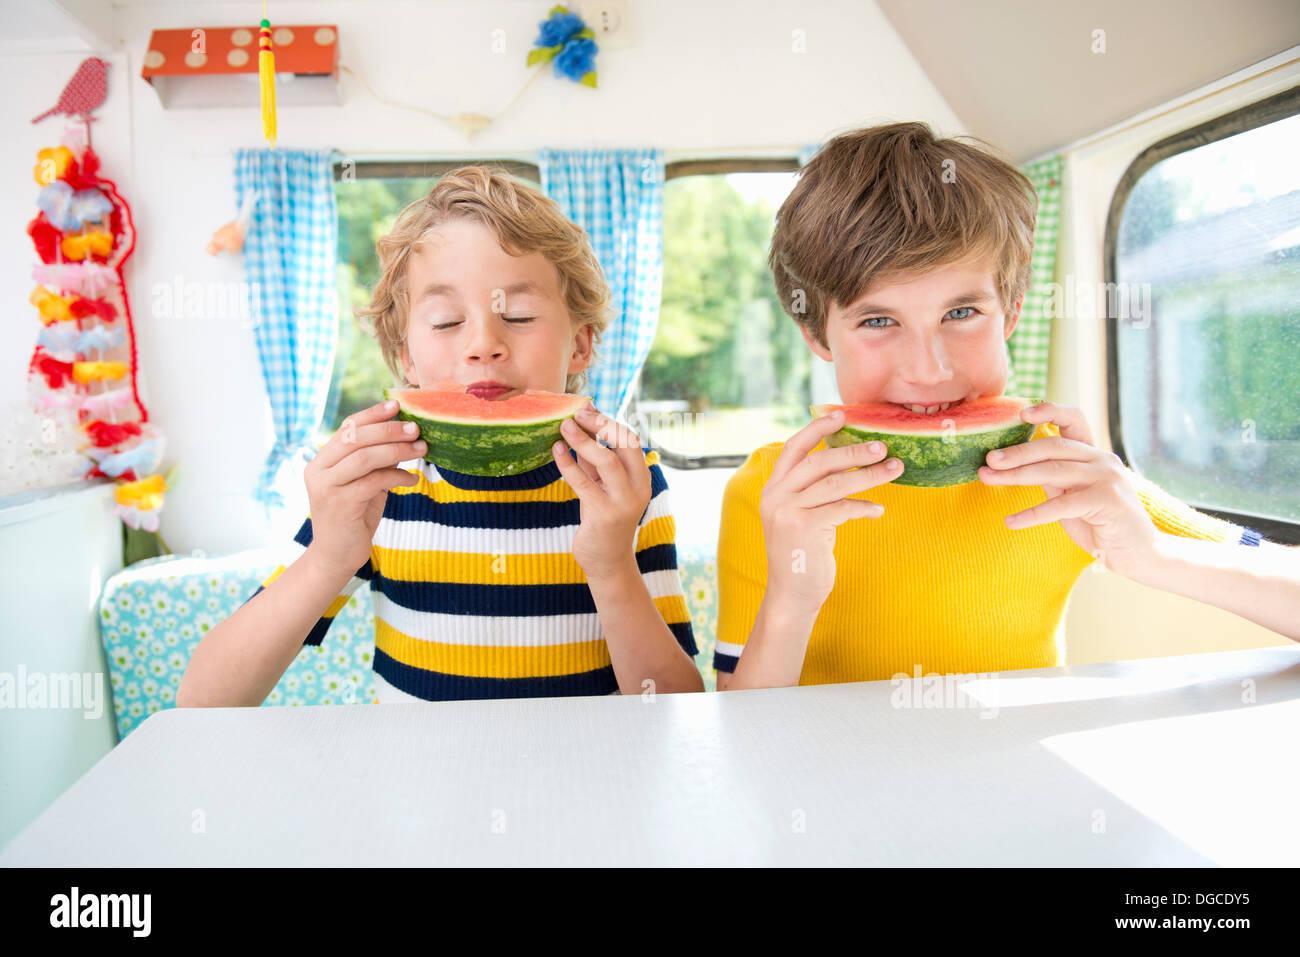 Boys eating watermelon in caravan, portrait - Stock Image